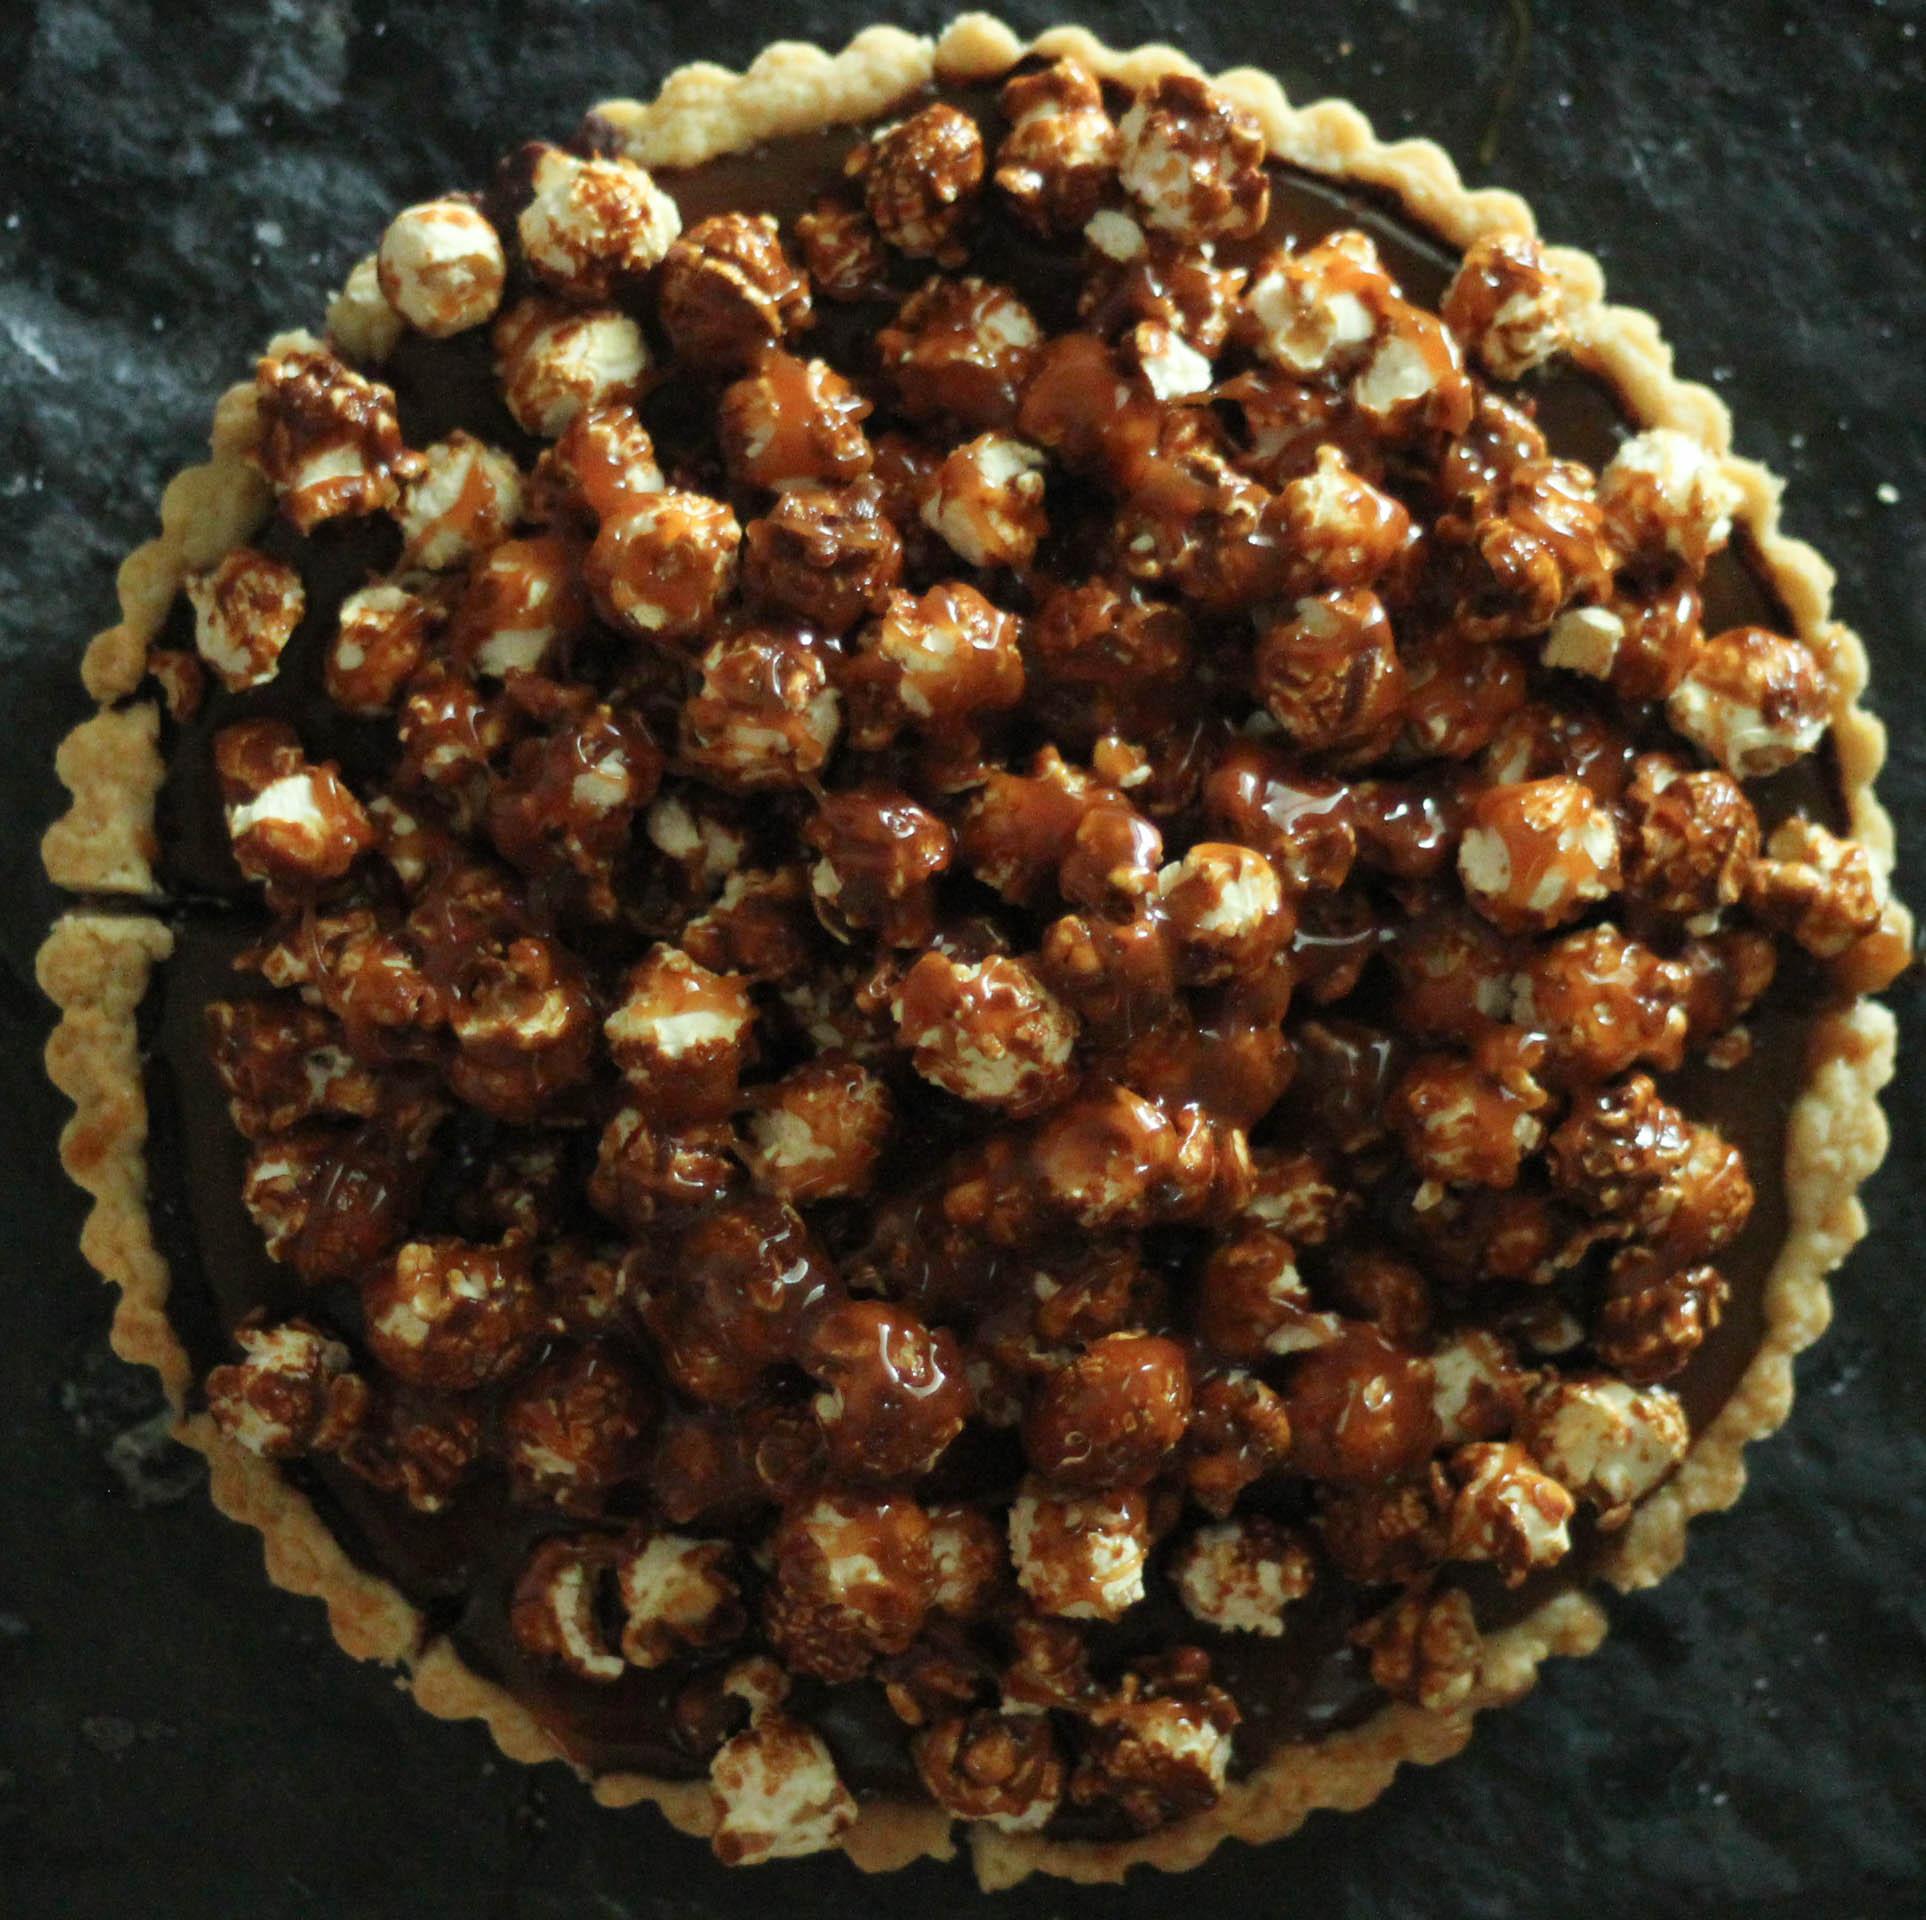 Chocolate, Caramel, +Popcorn Tart